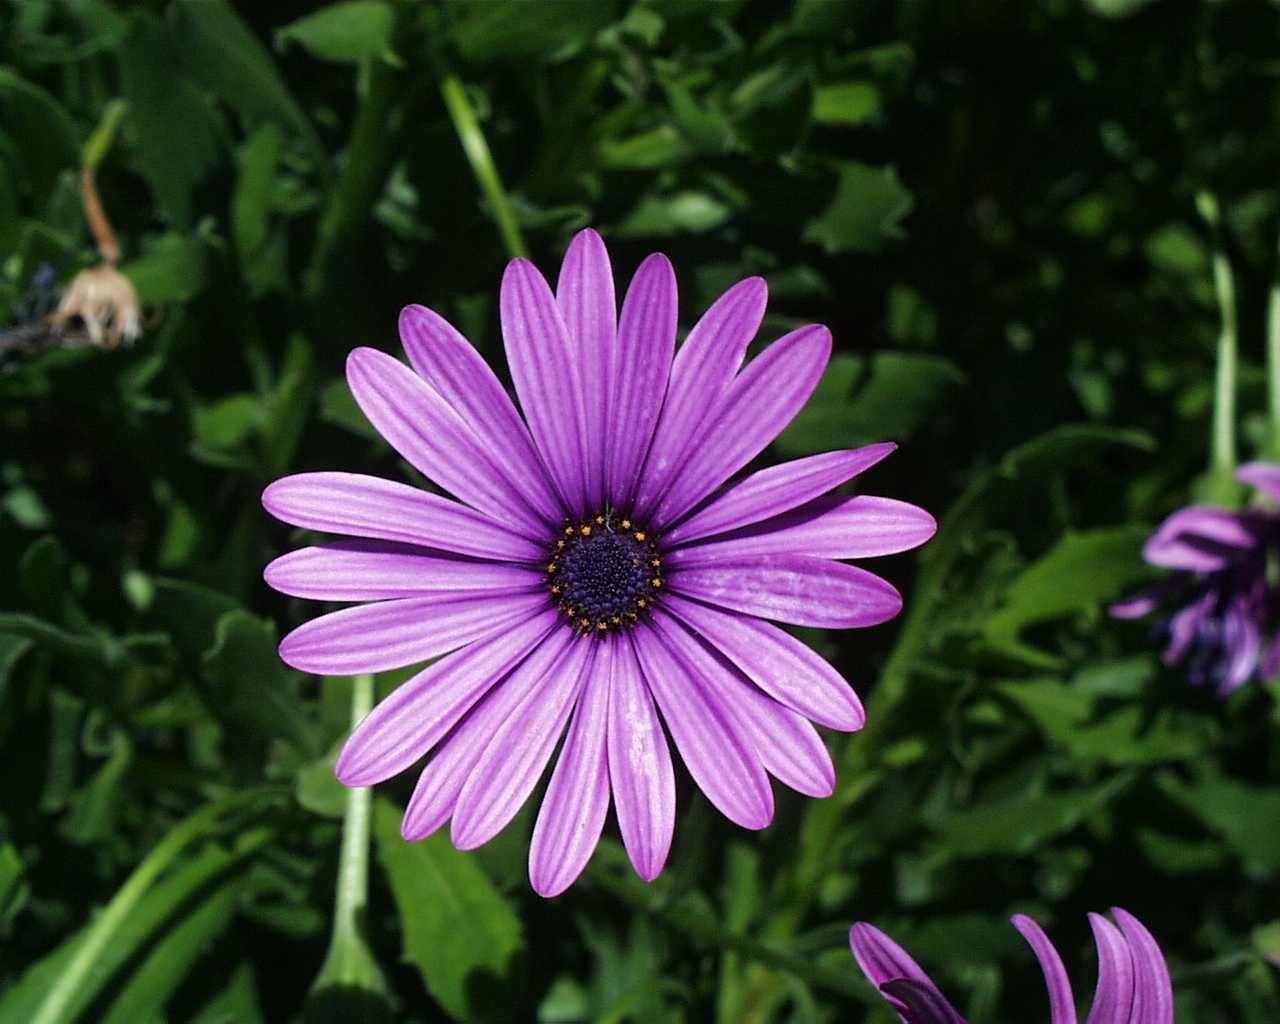 Fp 43 Lilac Flower Flower Power Pinterest Screensaver